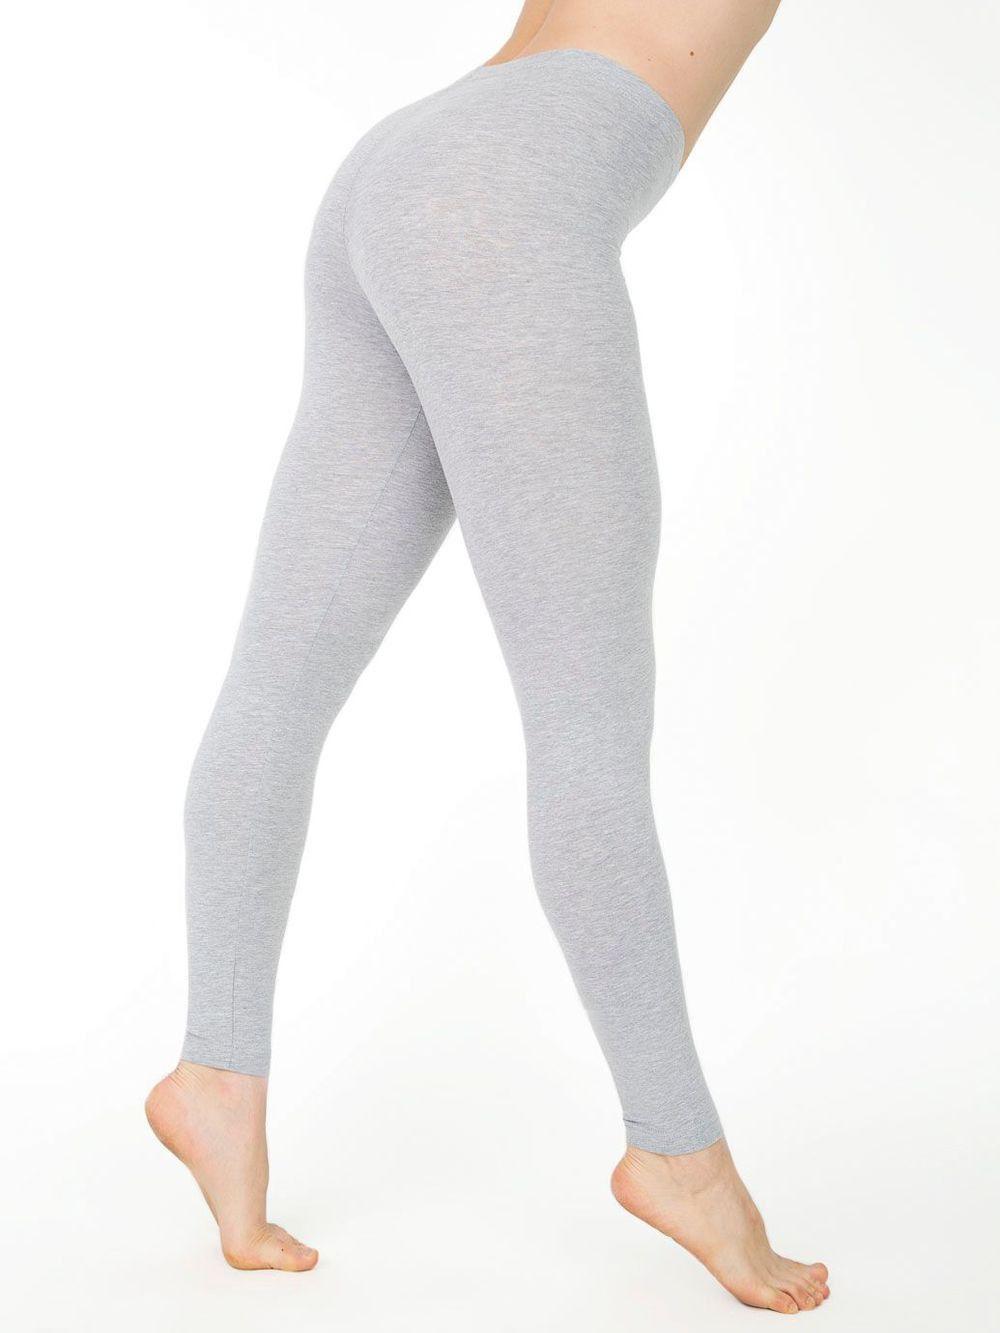 0312d62dc7f008 Item Type: Leggings Gender: Women Pattern Type: Solid Waist Type: Low  Material